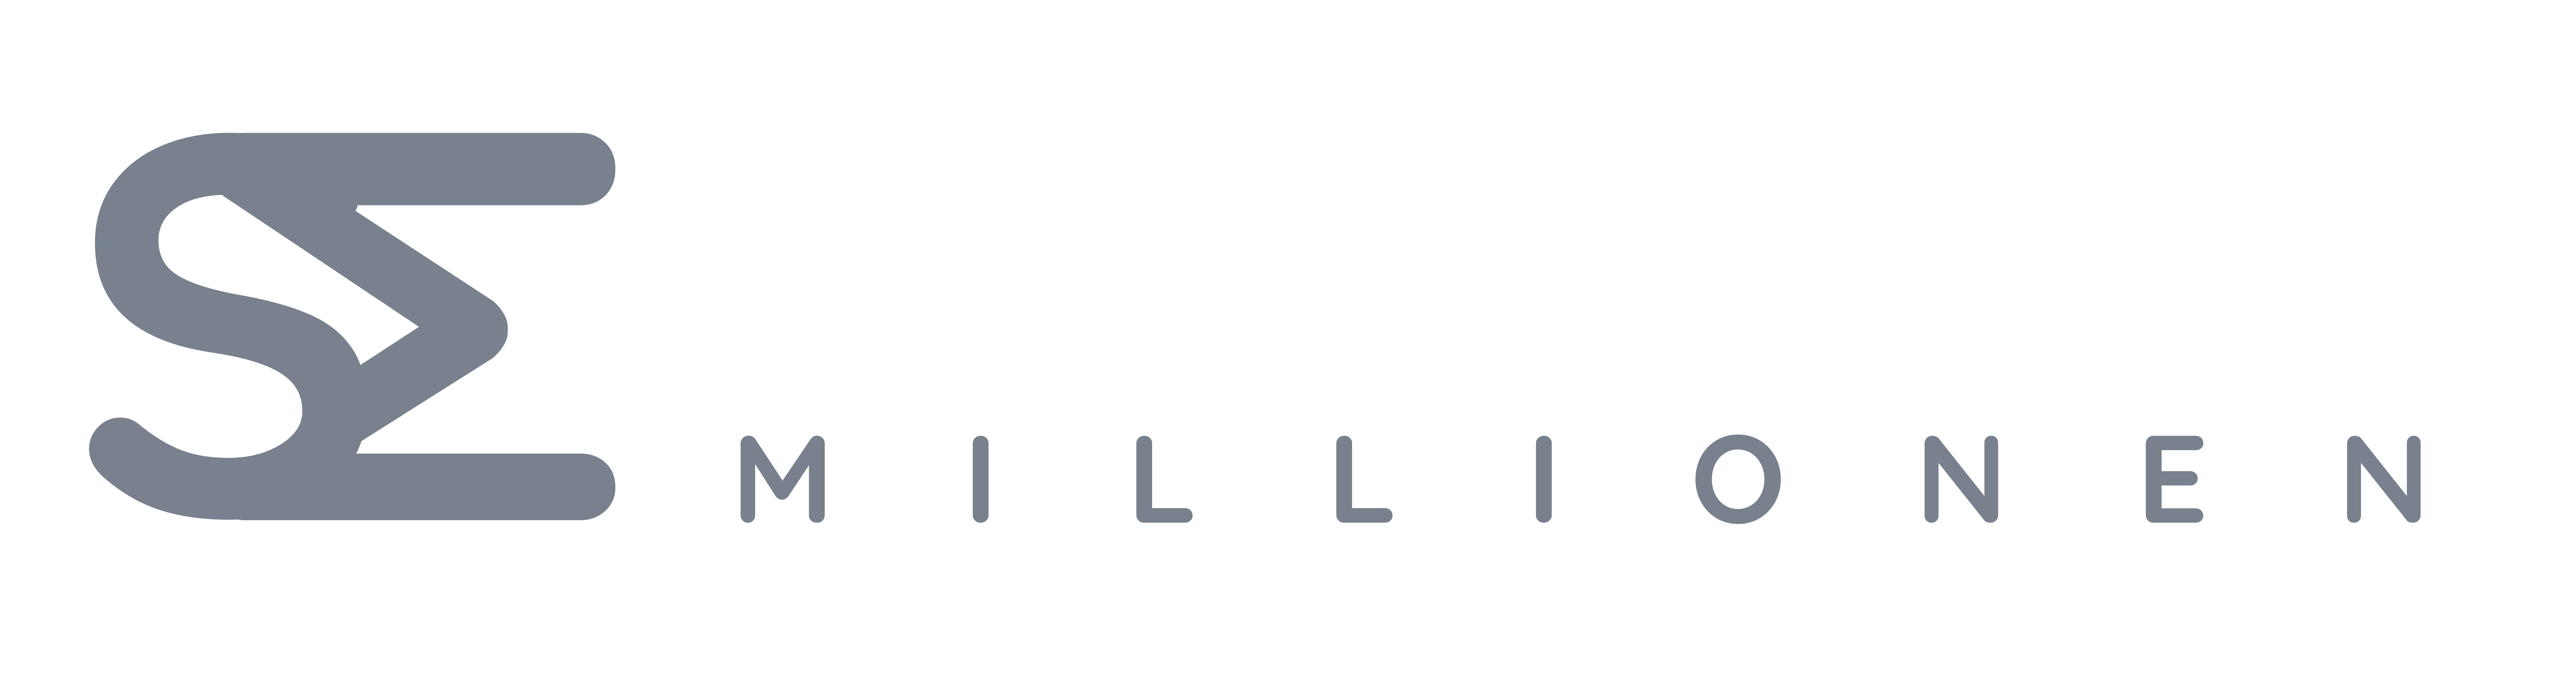 Selfmade Millionen Club Logo